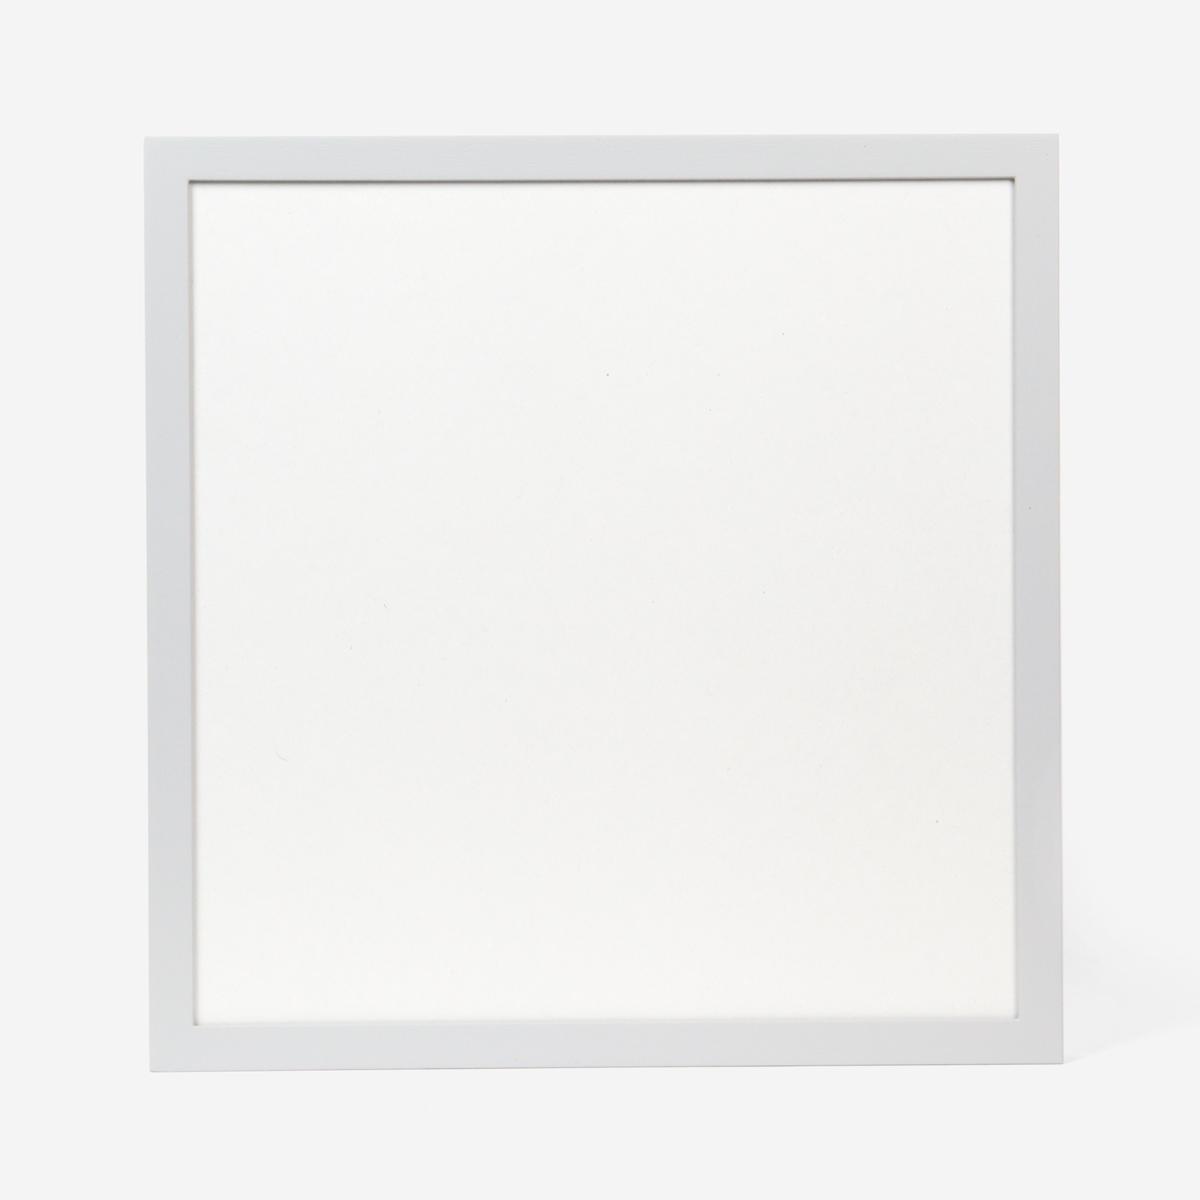 rikiki grafik produkt bilderrahmen lichtgrau 30 30 cm. Black Bedroom Furniture Sets. Home Design Ideas